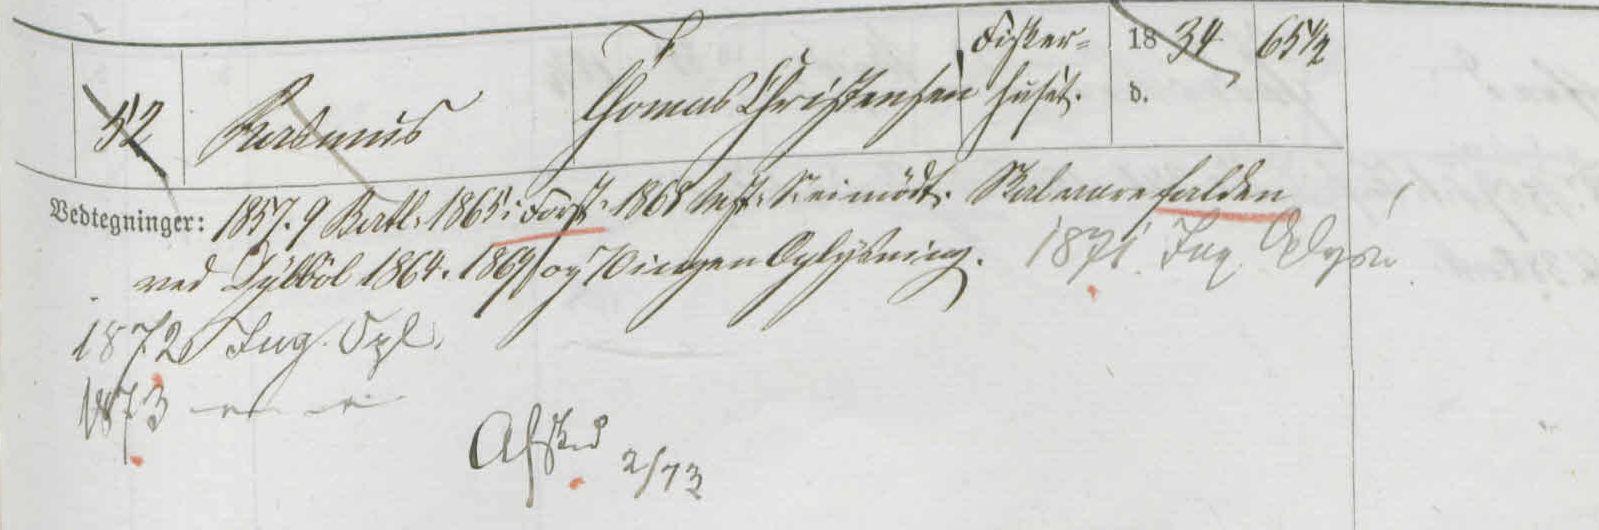 1864 Rasmus Thomasen